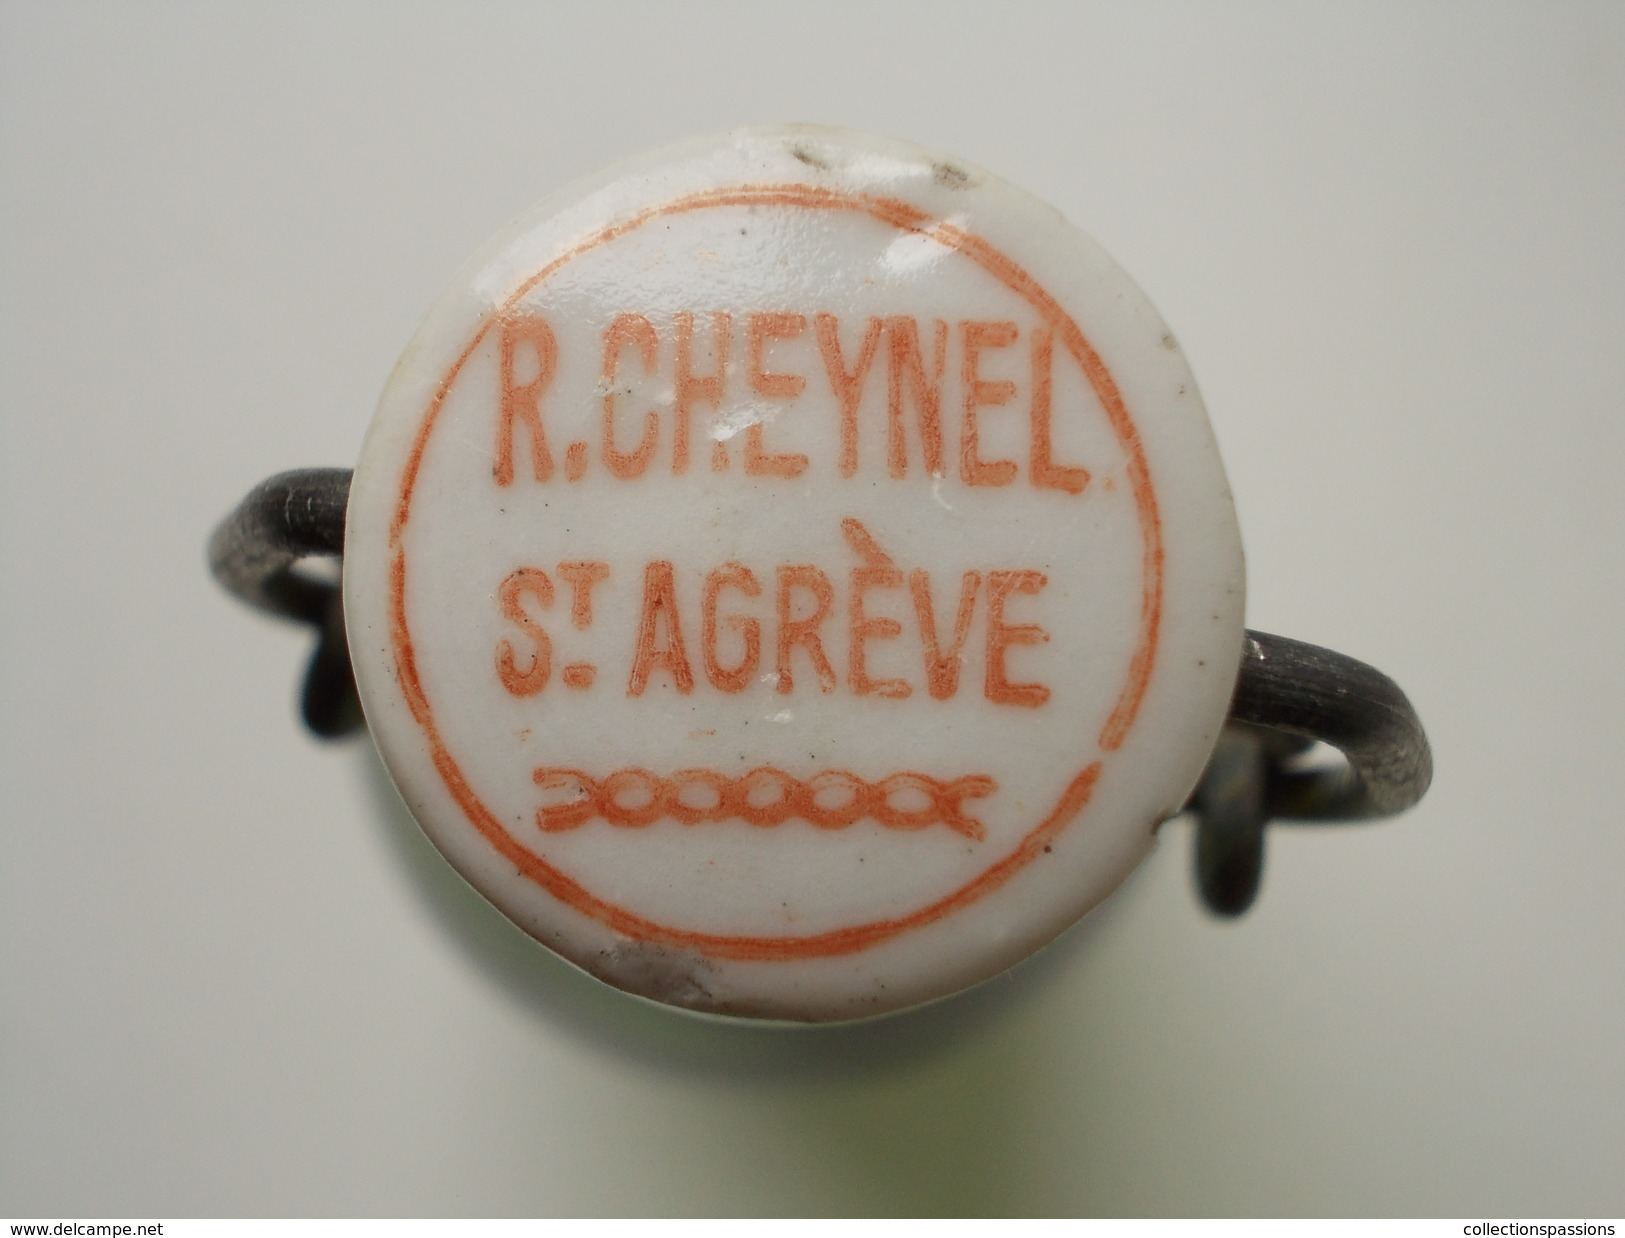 - RARE - Ancienne Bouteille. Limonade R. CHEYNEL - St Agrève - - Autres Collections